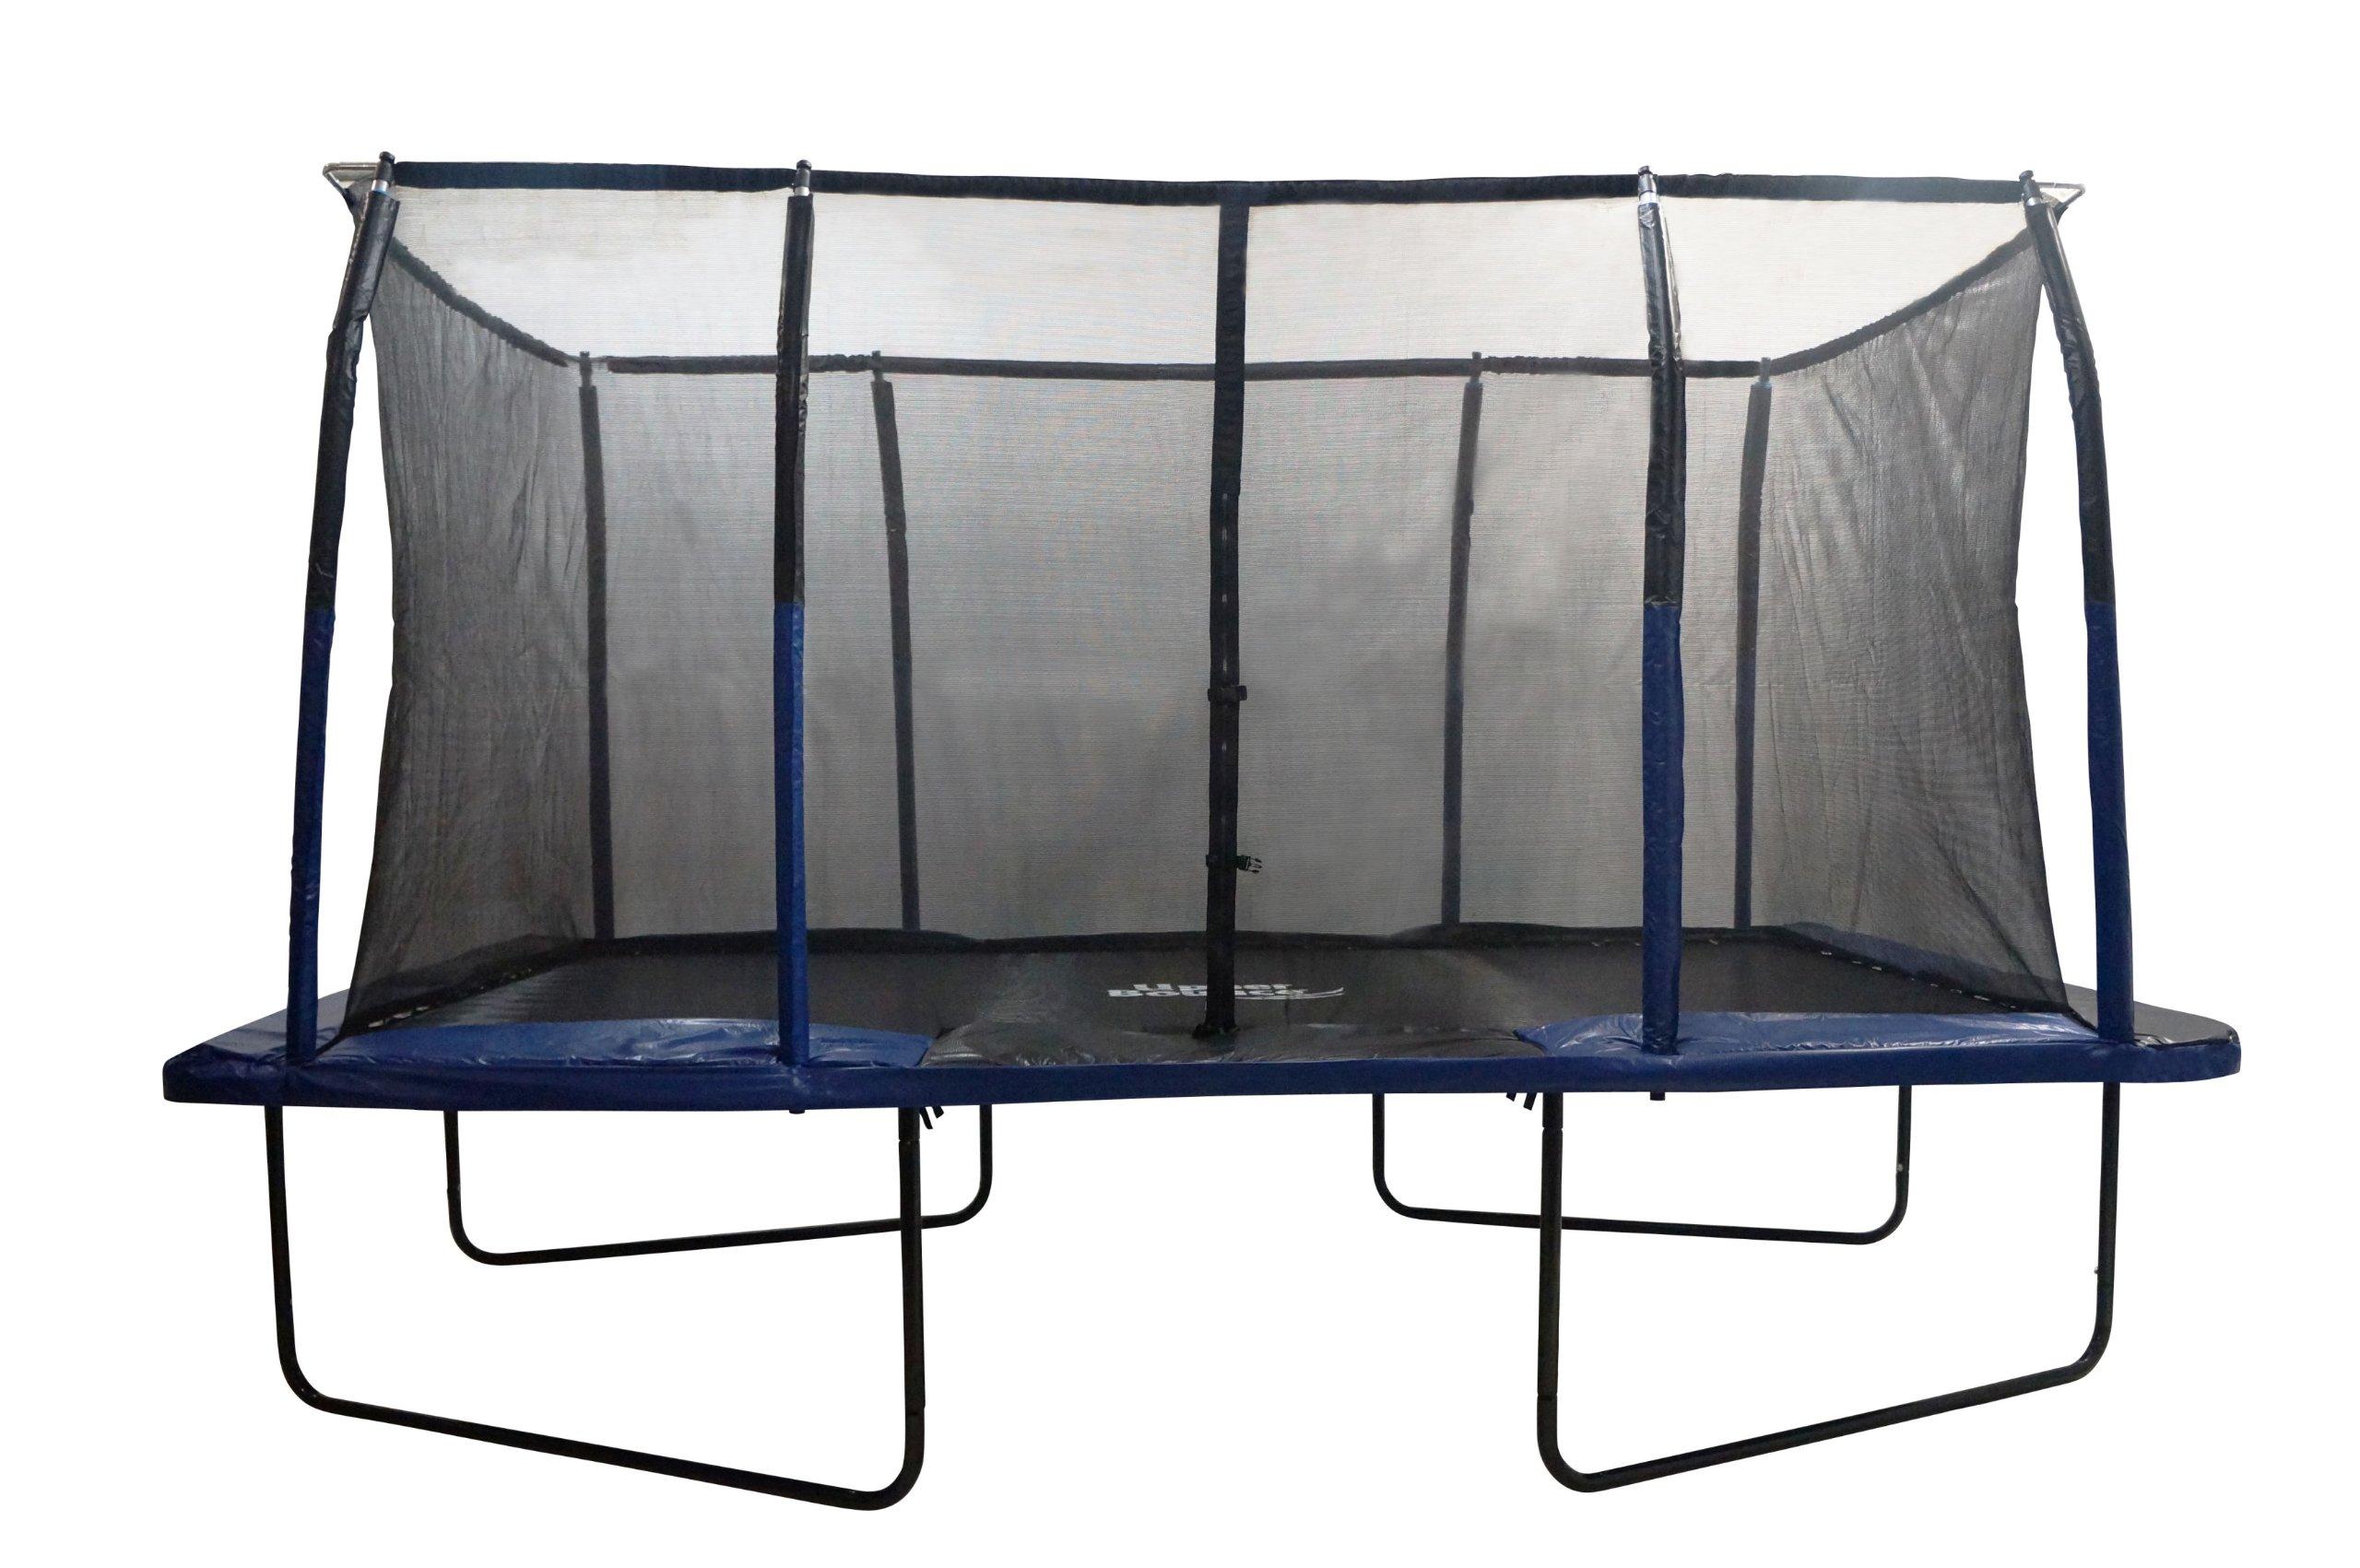 Upper Bounce Easy Assemble Spacious Rectangular Trampoline with Fiber Flex Enclosure Feature, 8 x 14-Feet